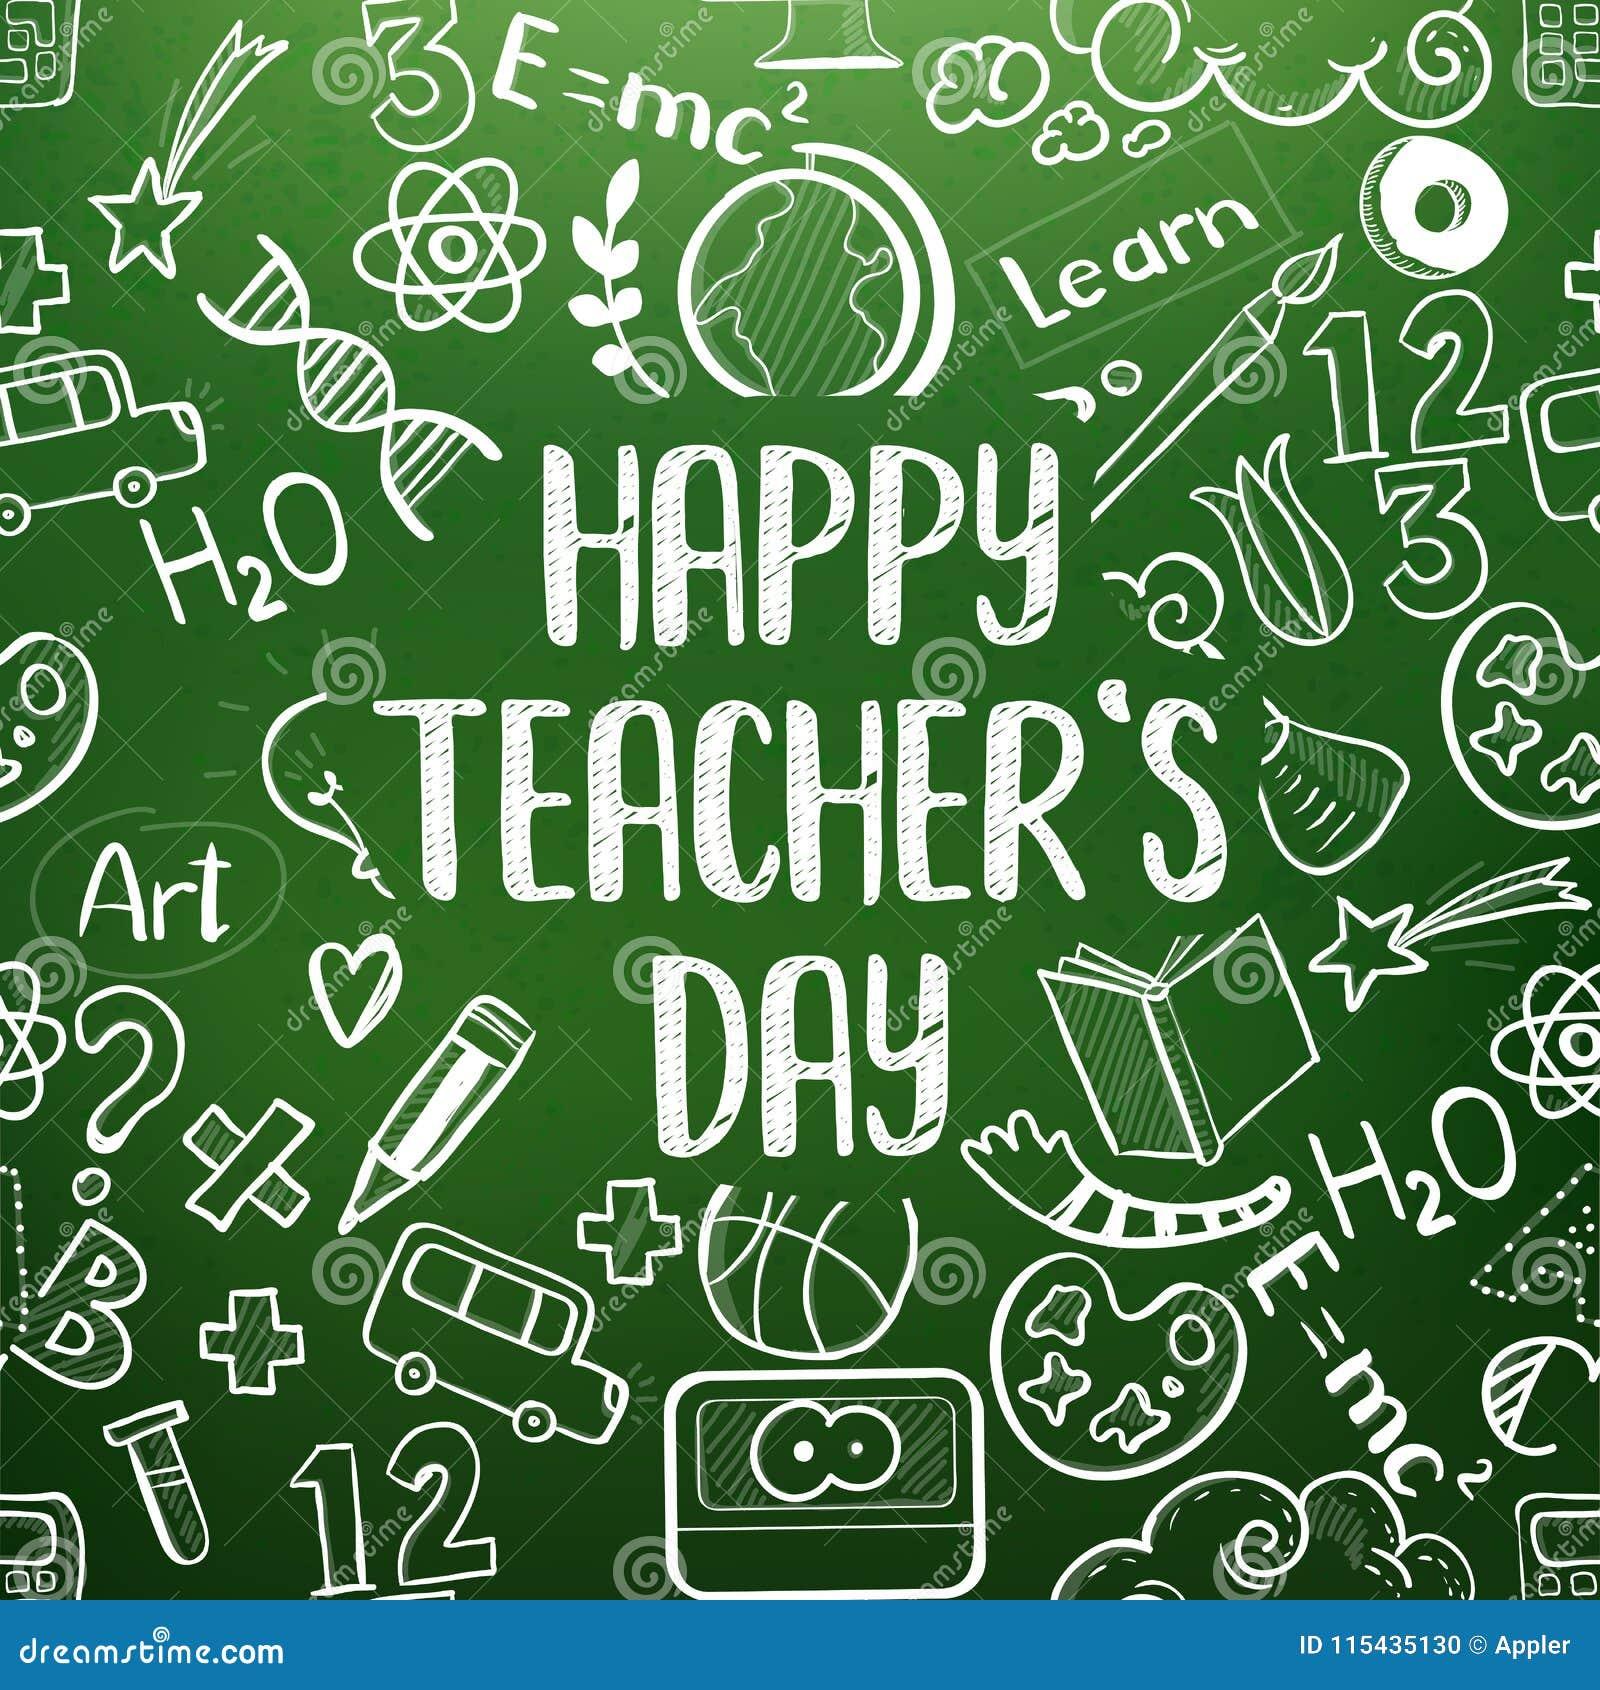 Happy teachers day greetings stock vector illustration of class download happy teachers day greetings stock vector illustration of class chalk m4hsunfo